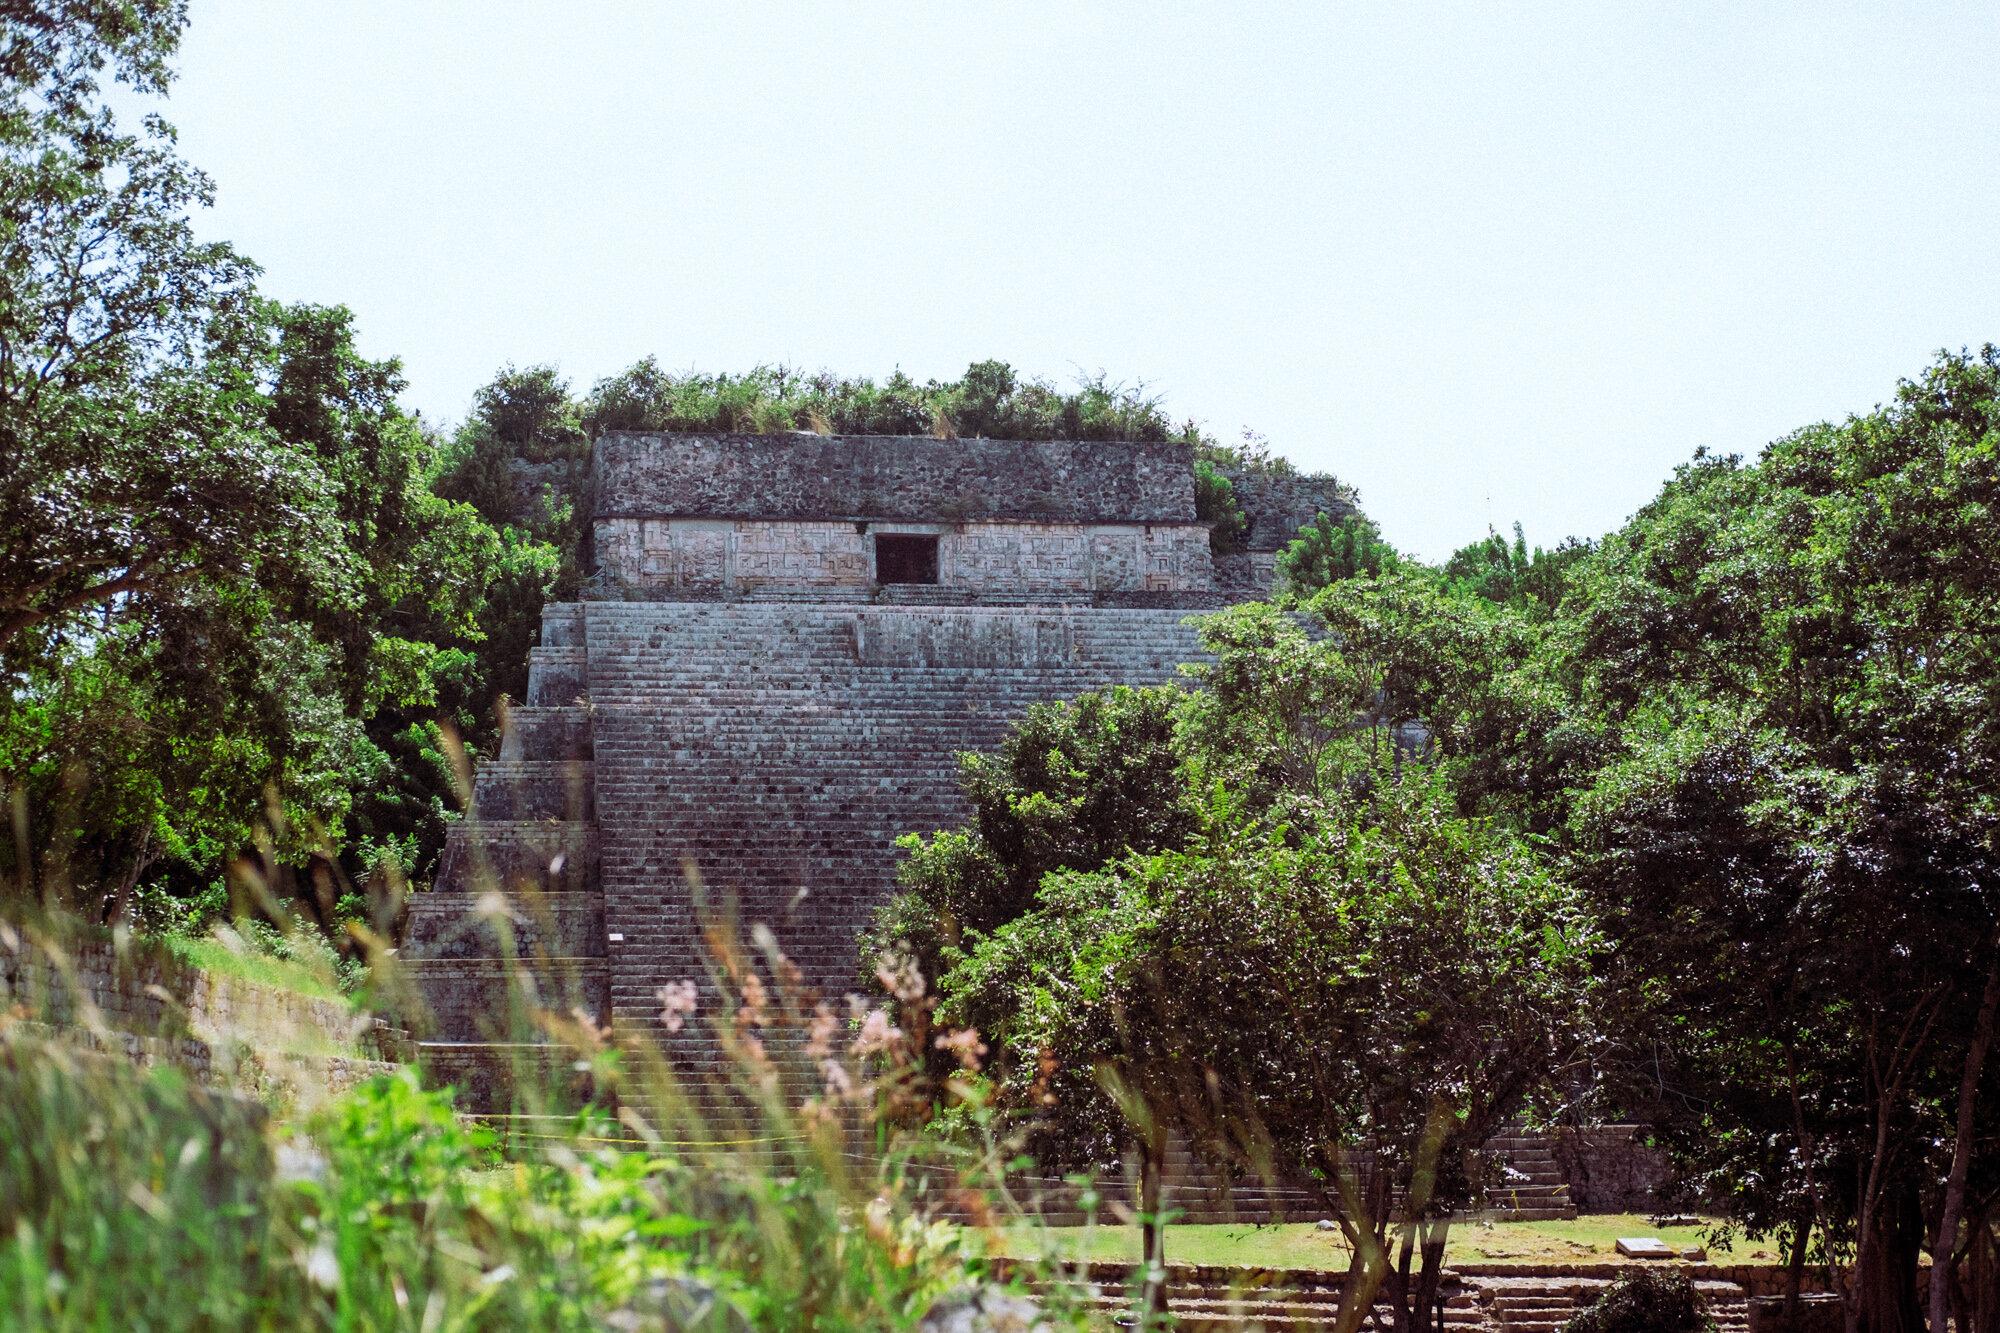 Rachel Off Duty: The Ancient Maya Ruins in Uxmal, Mexico